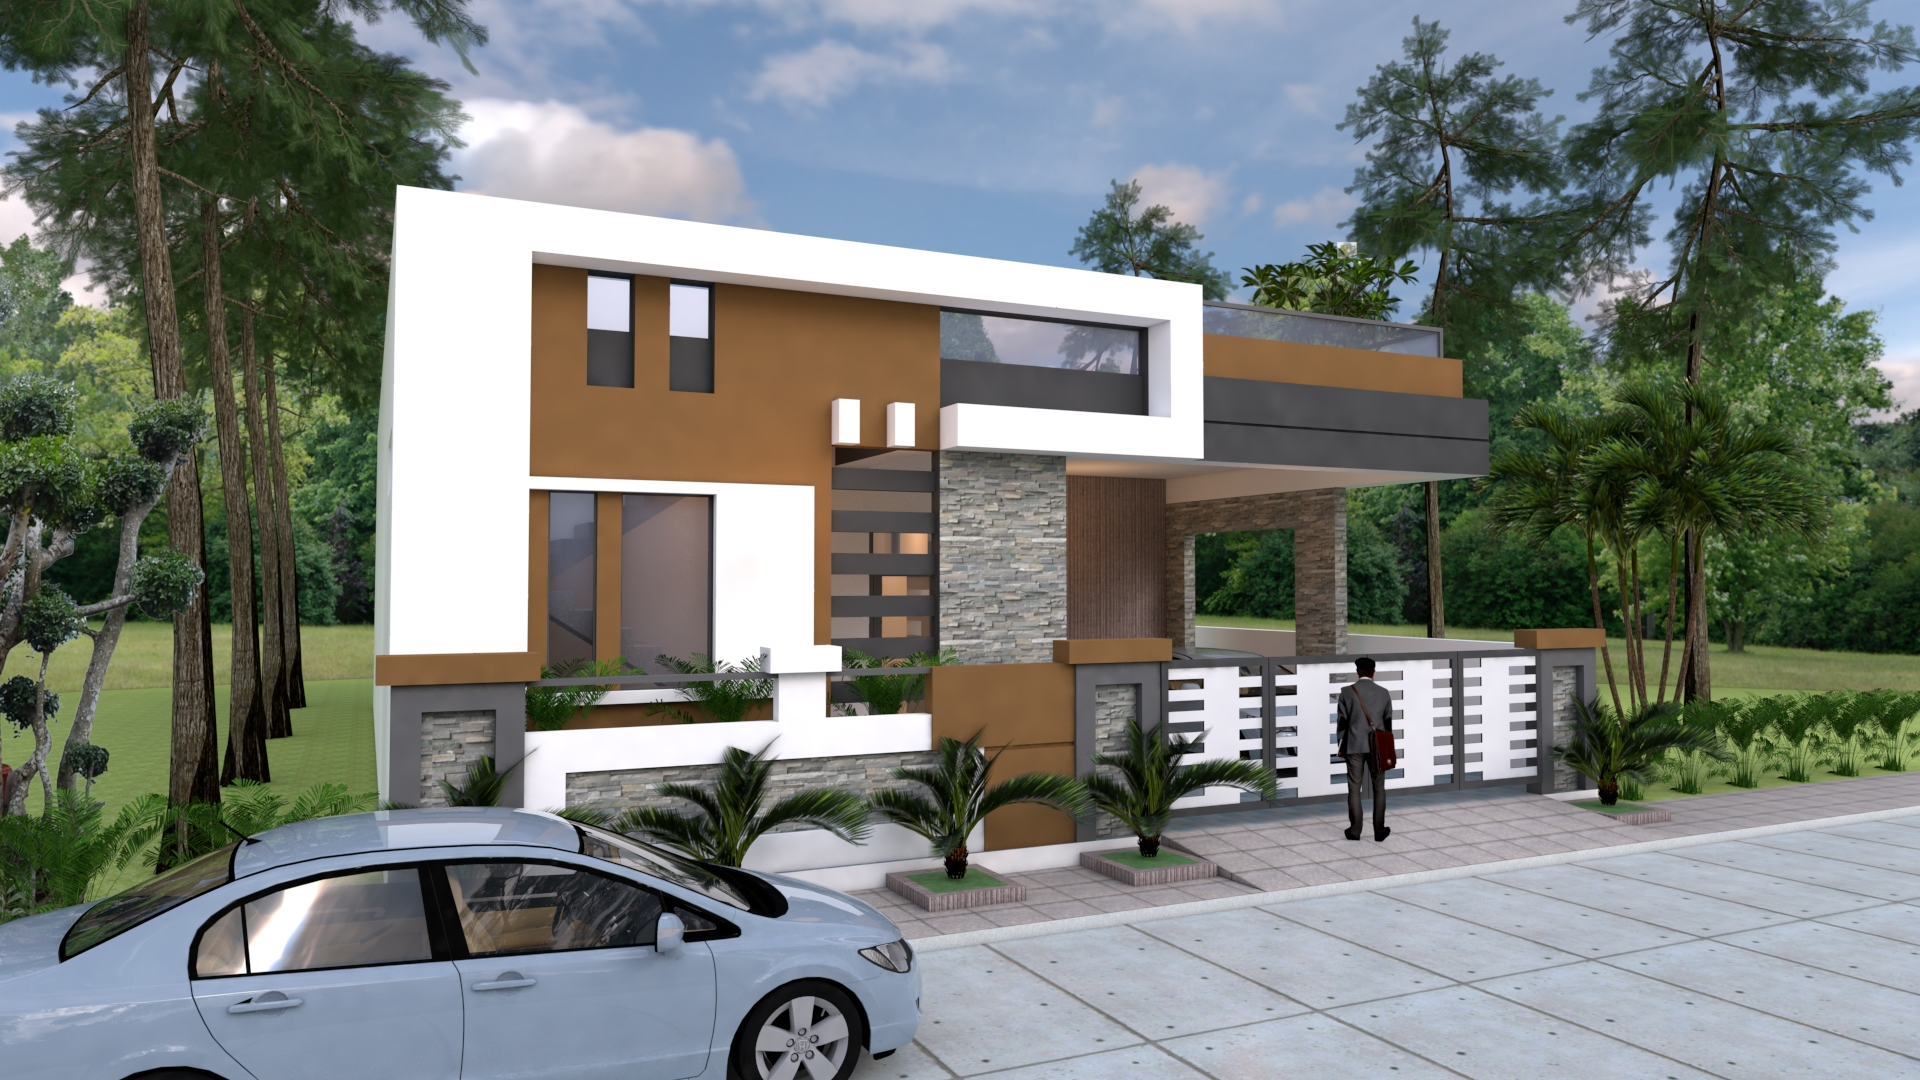 House Elevation 3d